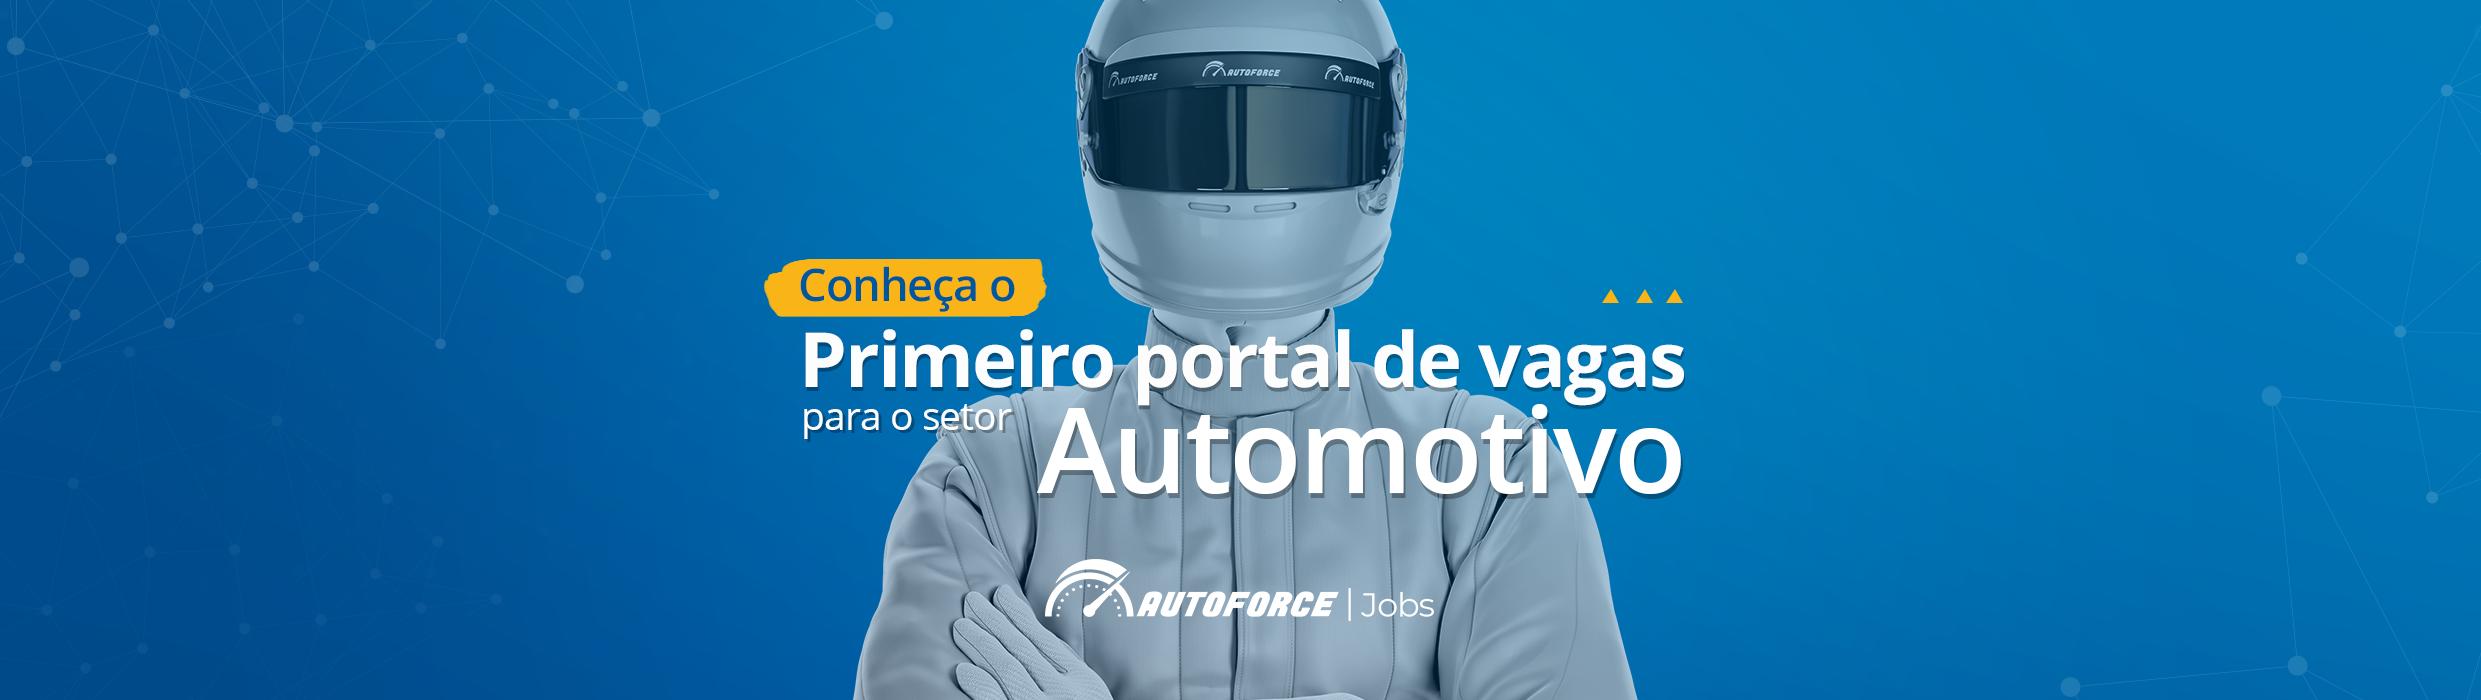 autoforce jobs